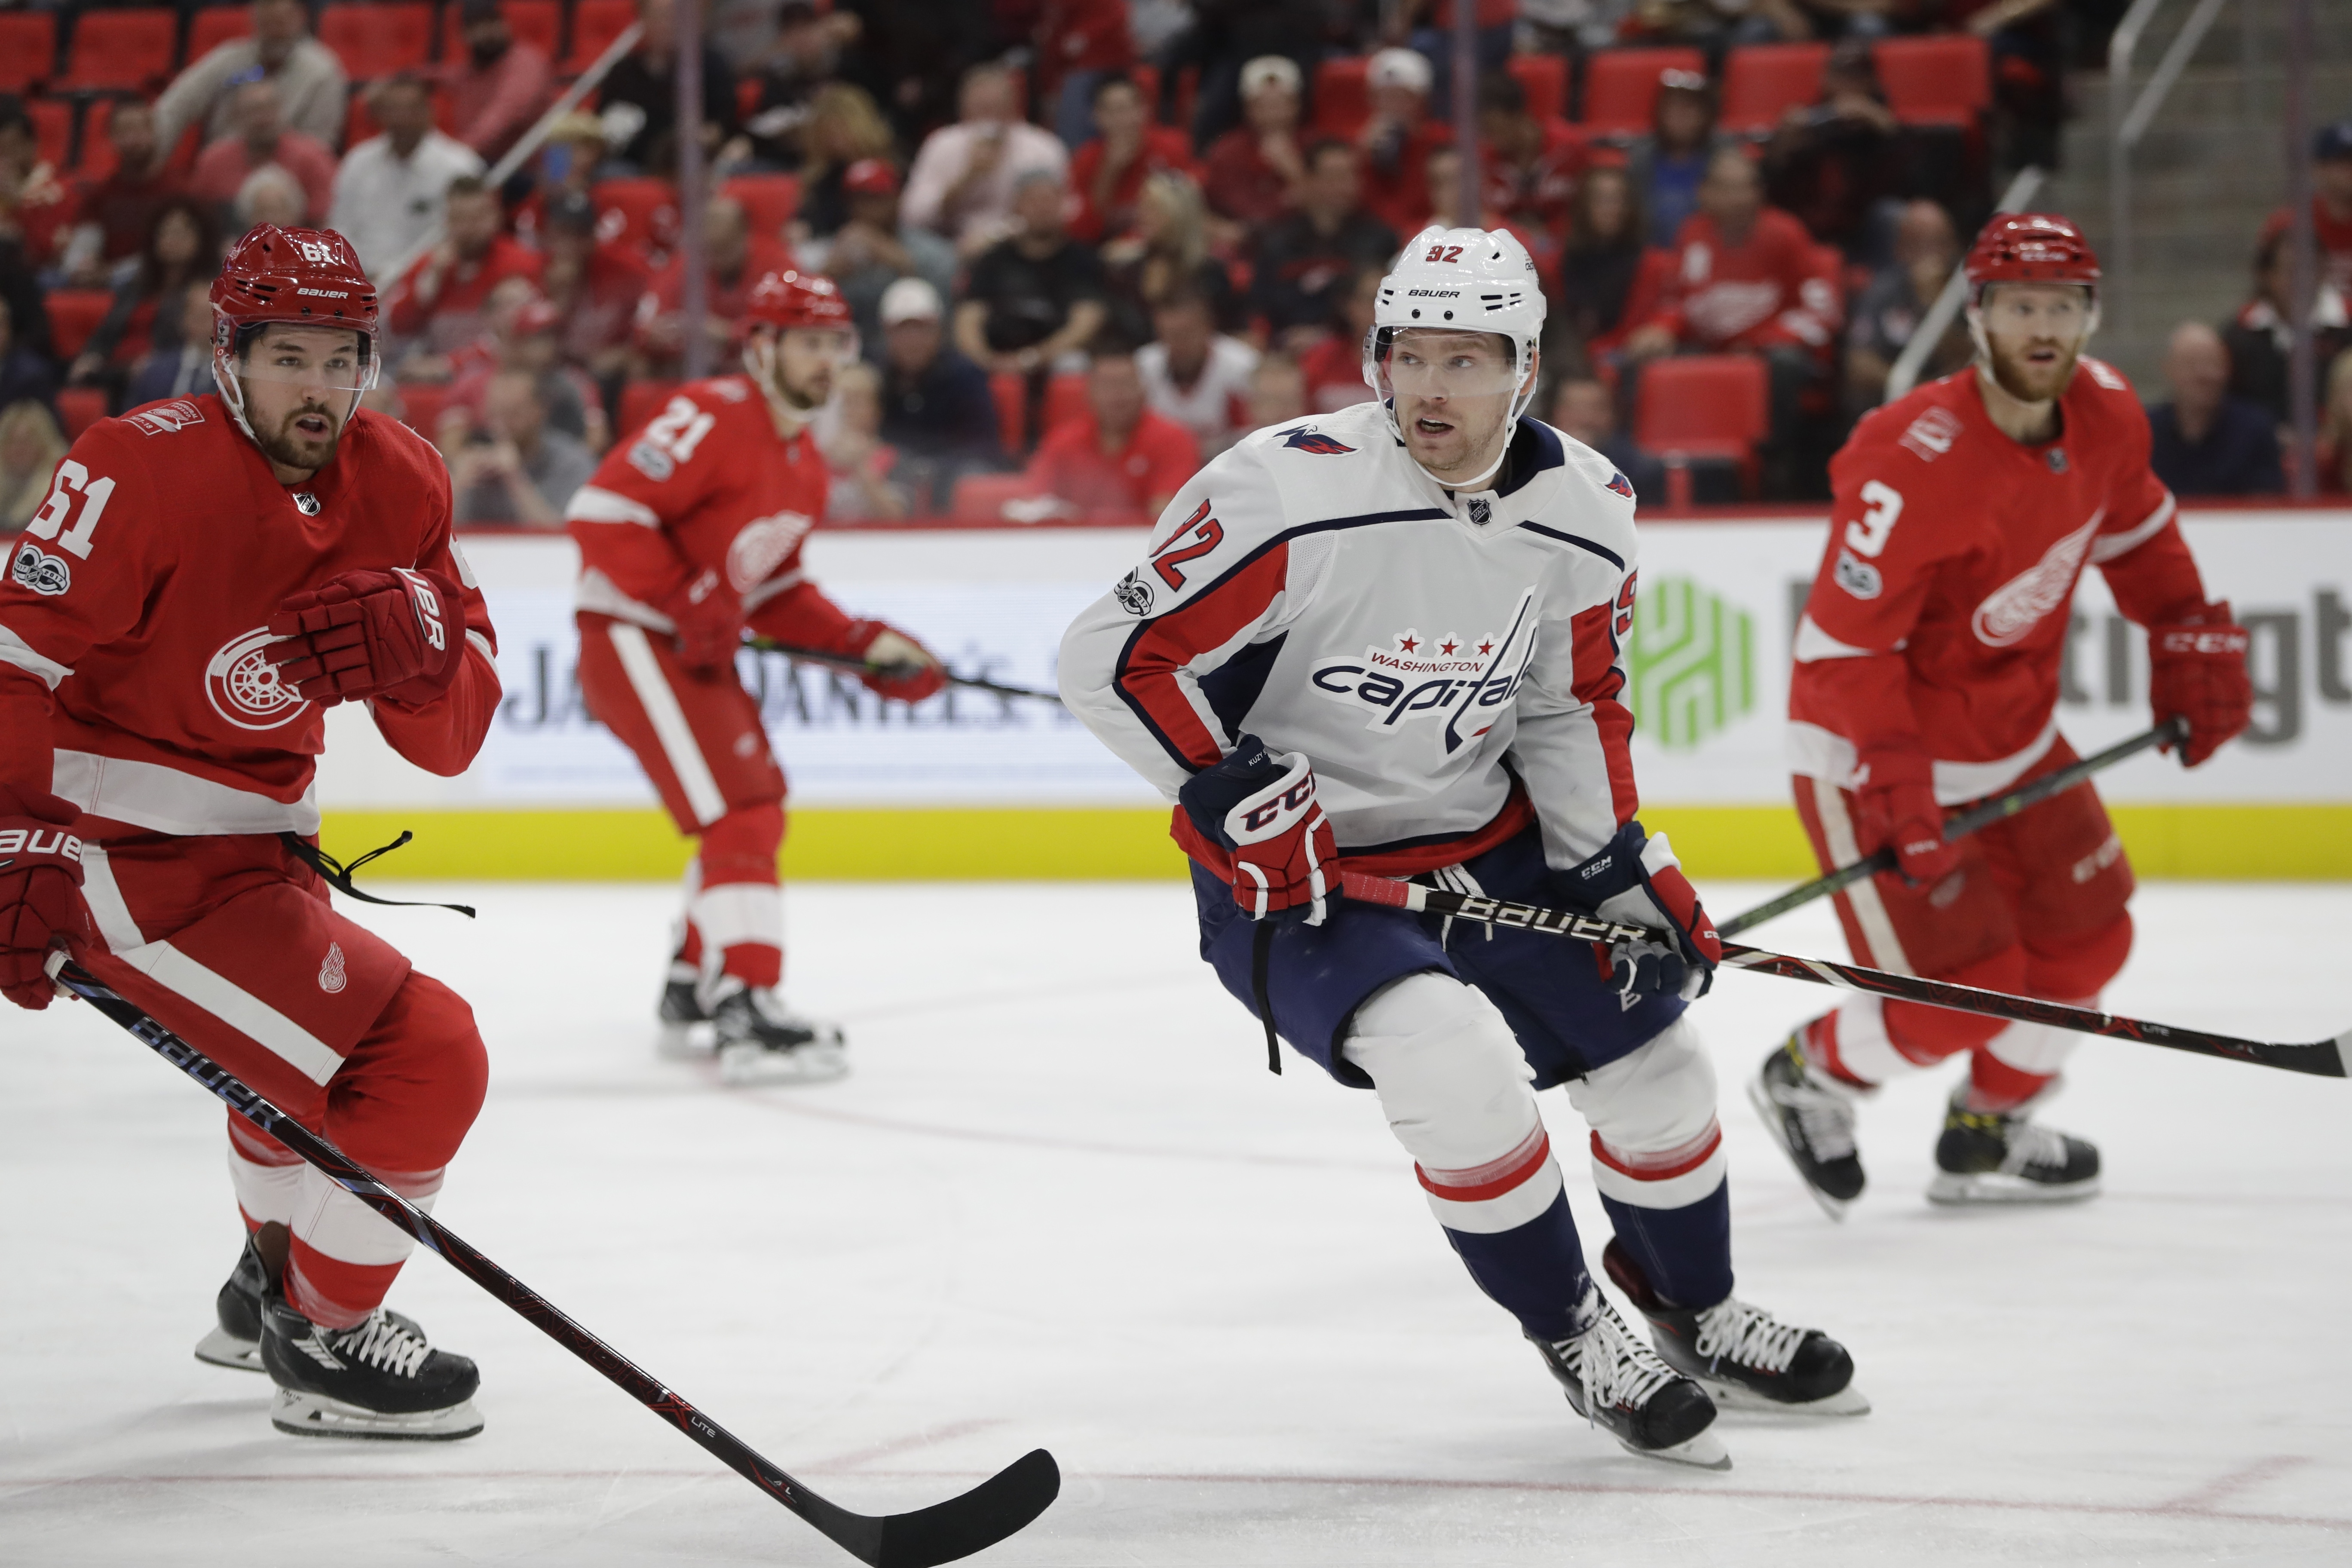 Capitals_red_wings_hockey_91521.jpg-f6675